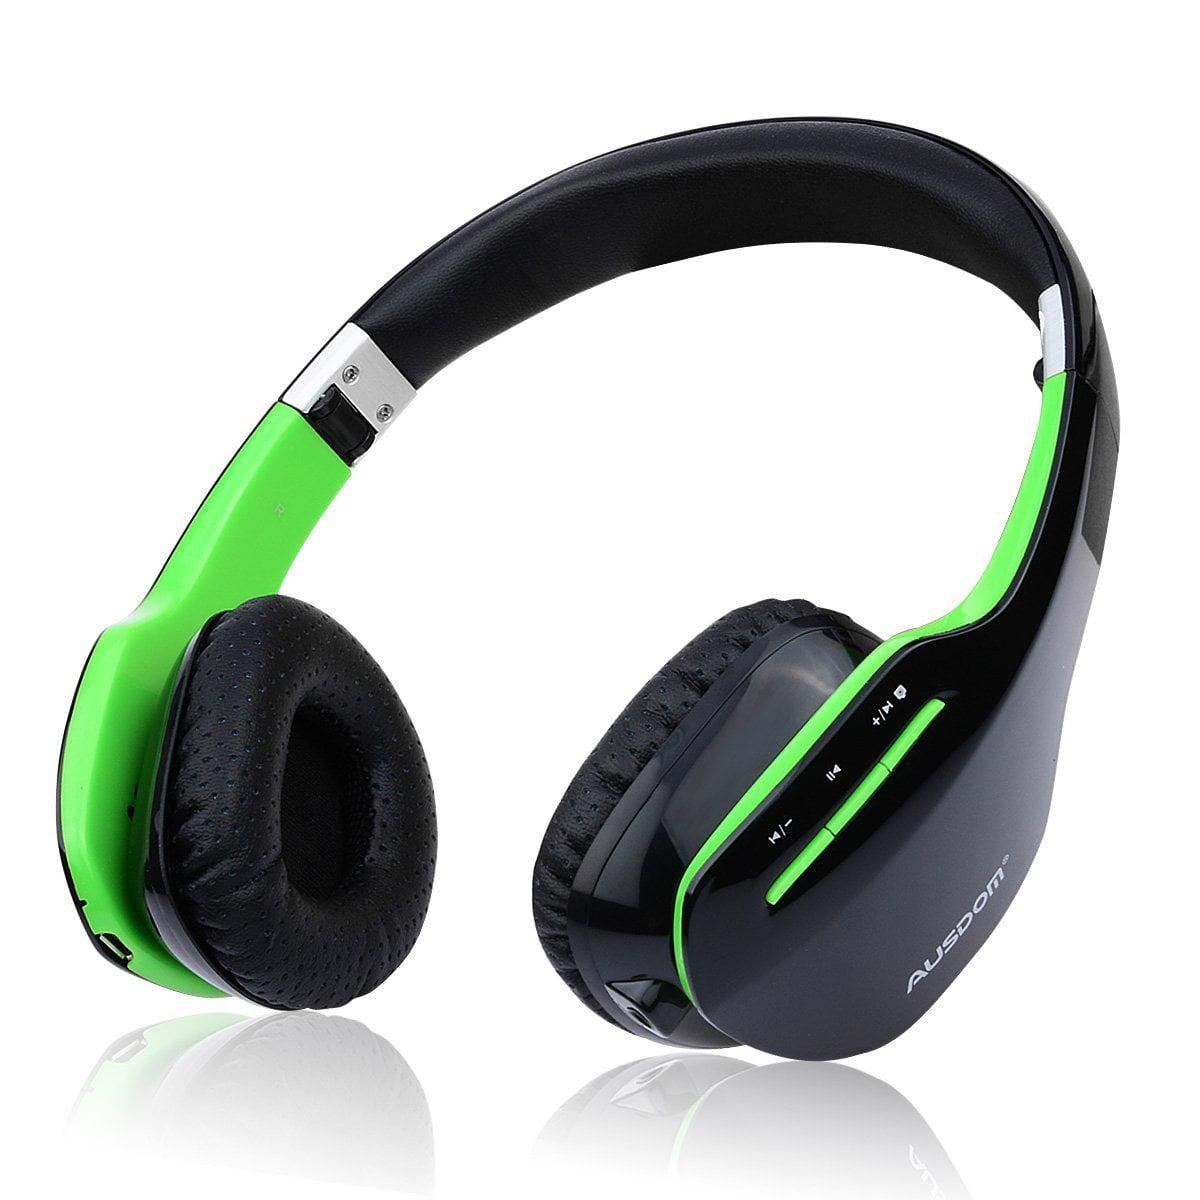 Ausdom M07s Foldable Over_Ear Bluetooth Wireless Headphon...